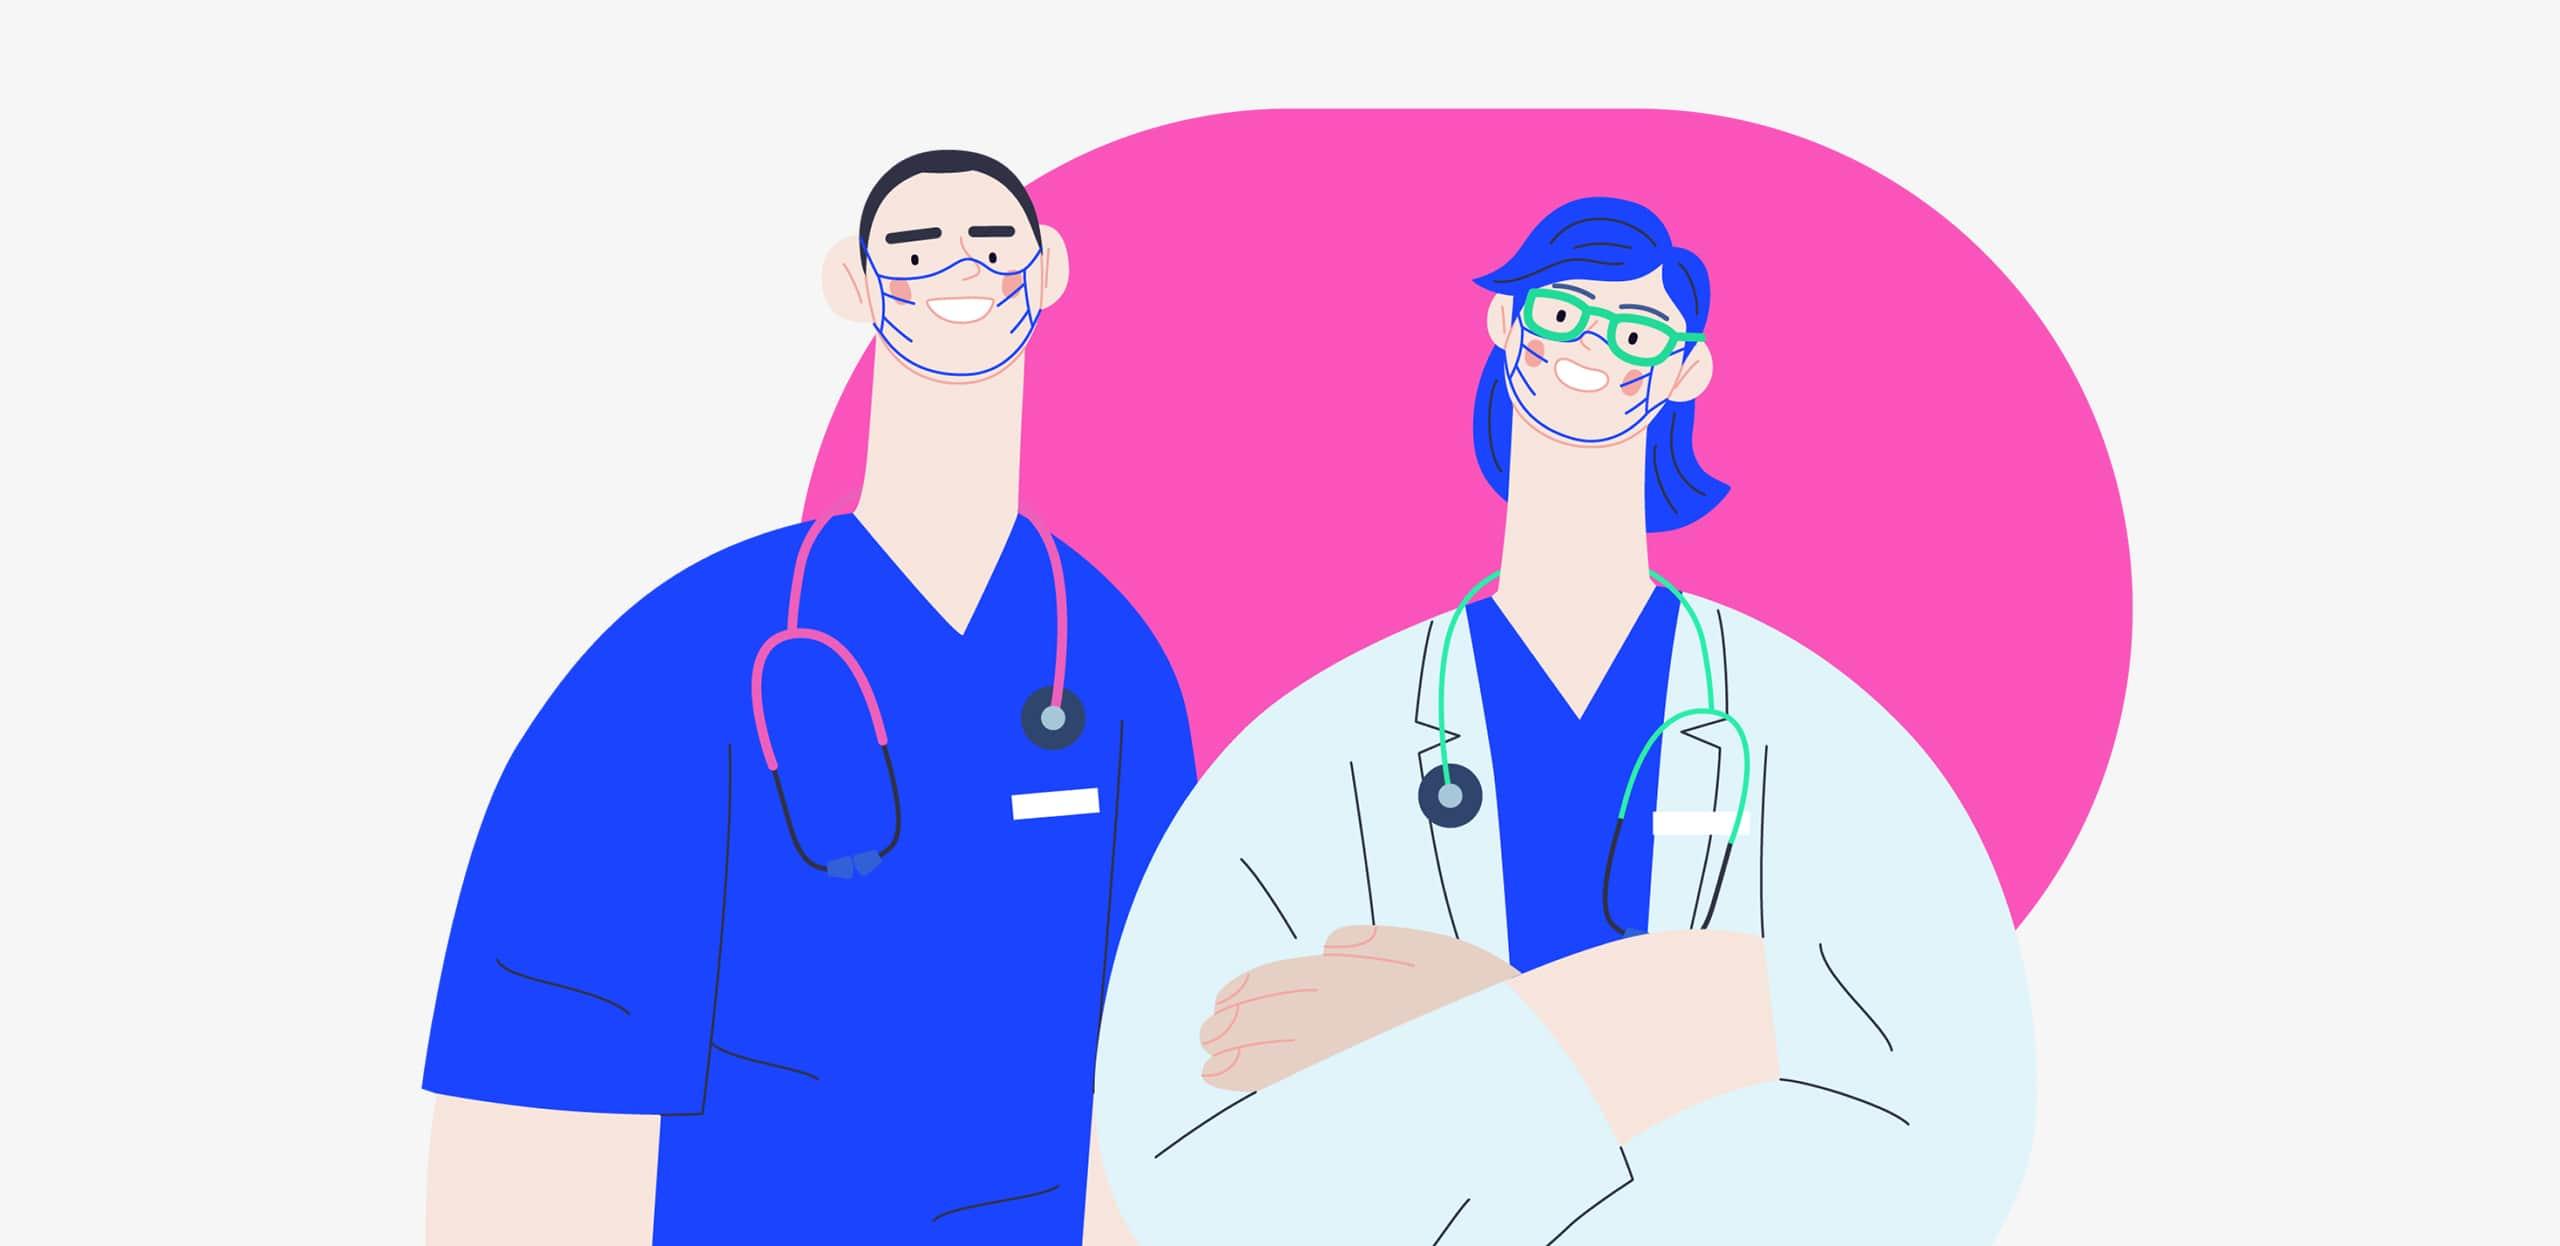 ОК запустили центр информации о COVID-19 и вакцинации